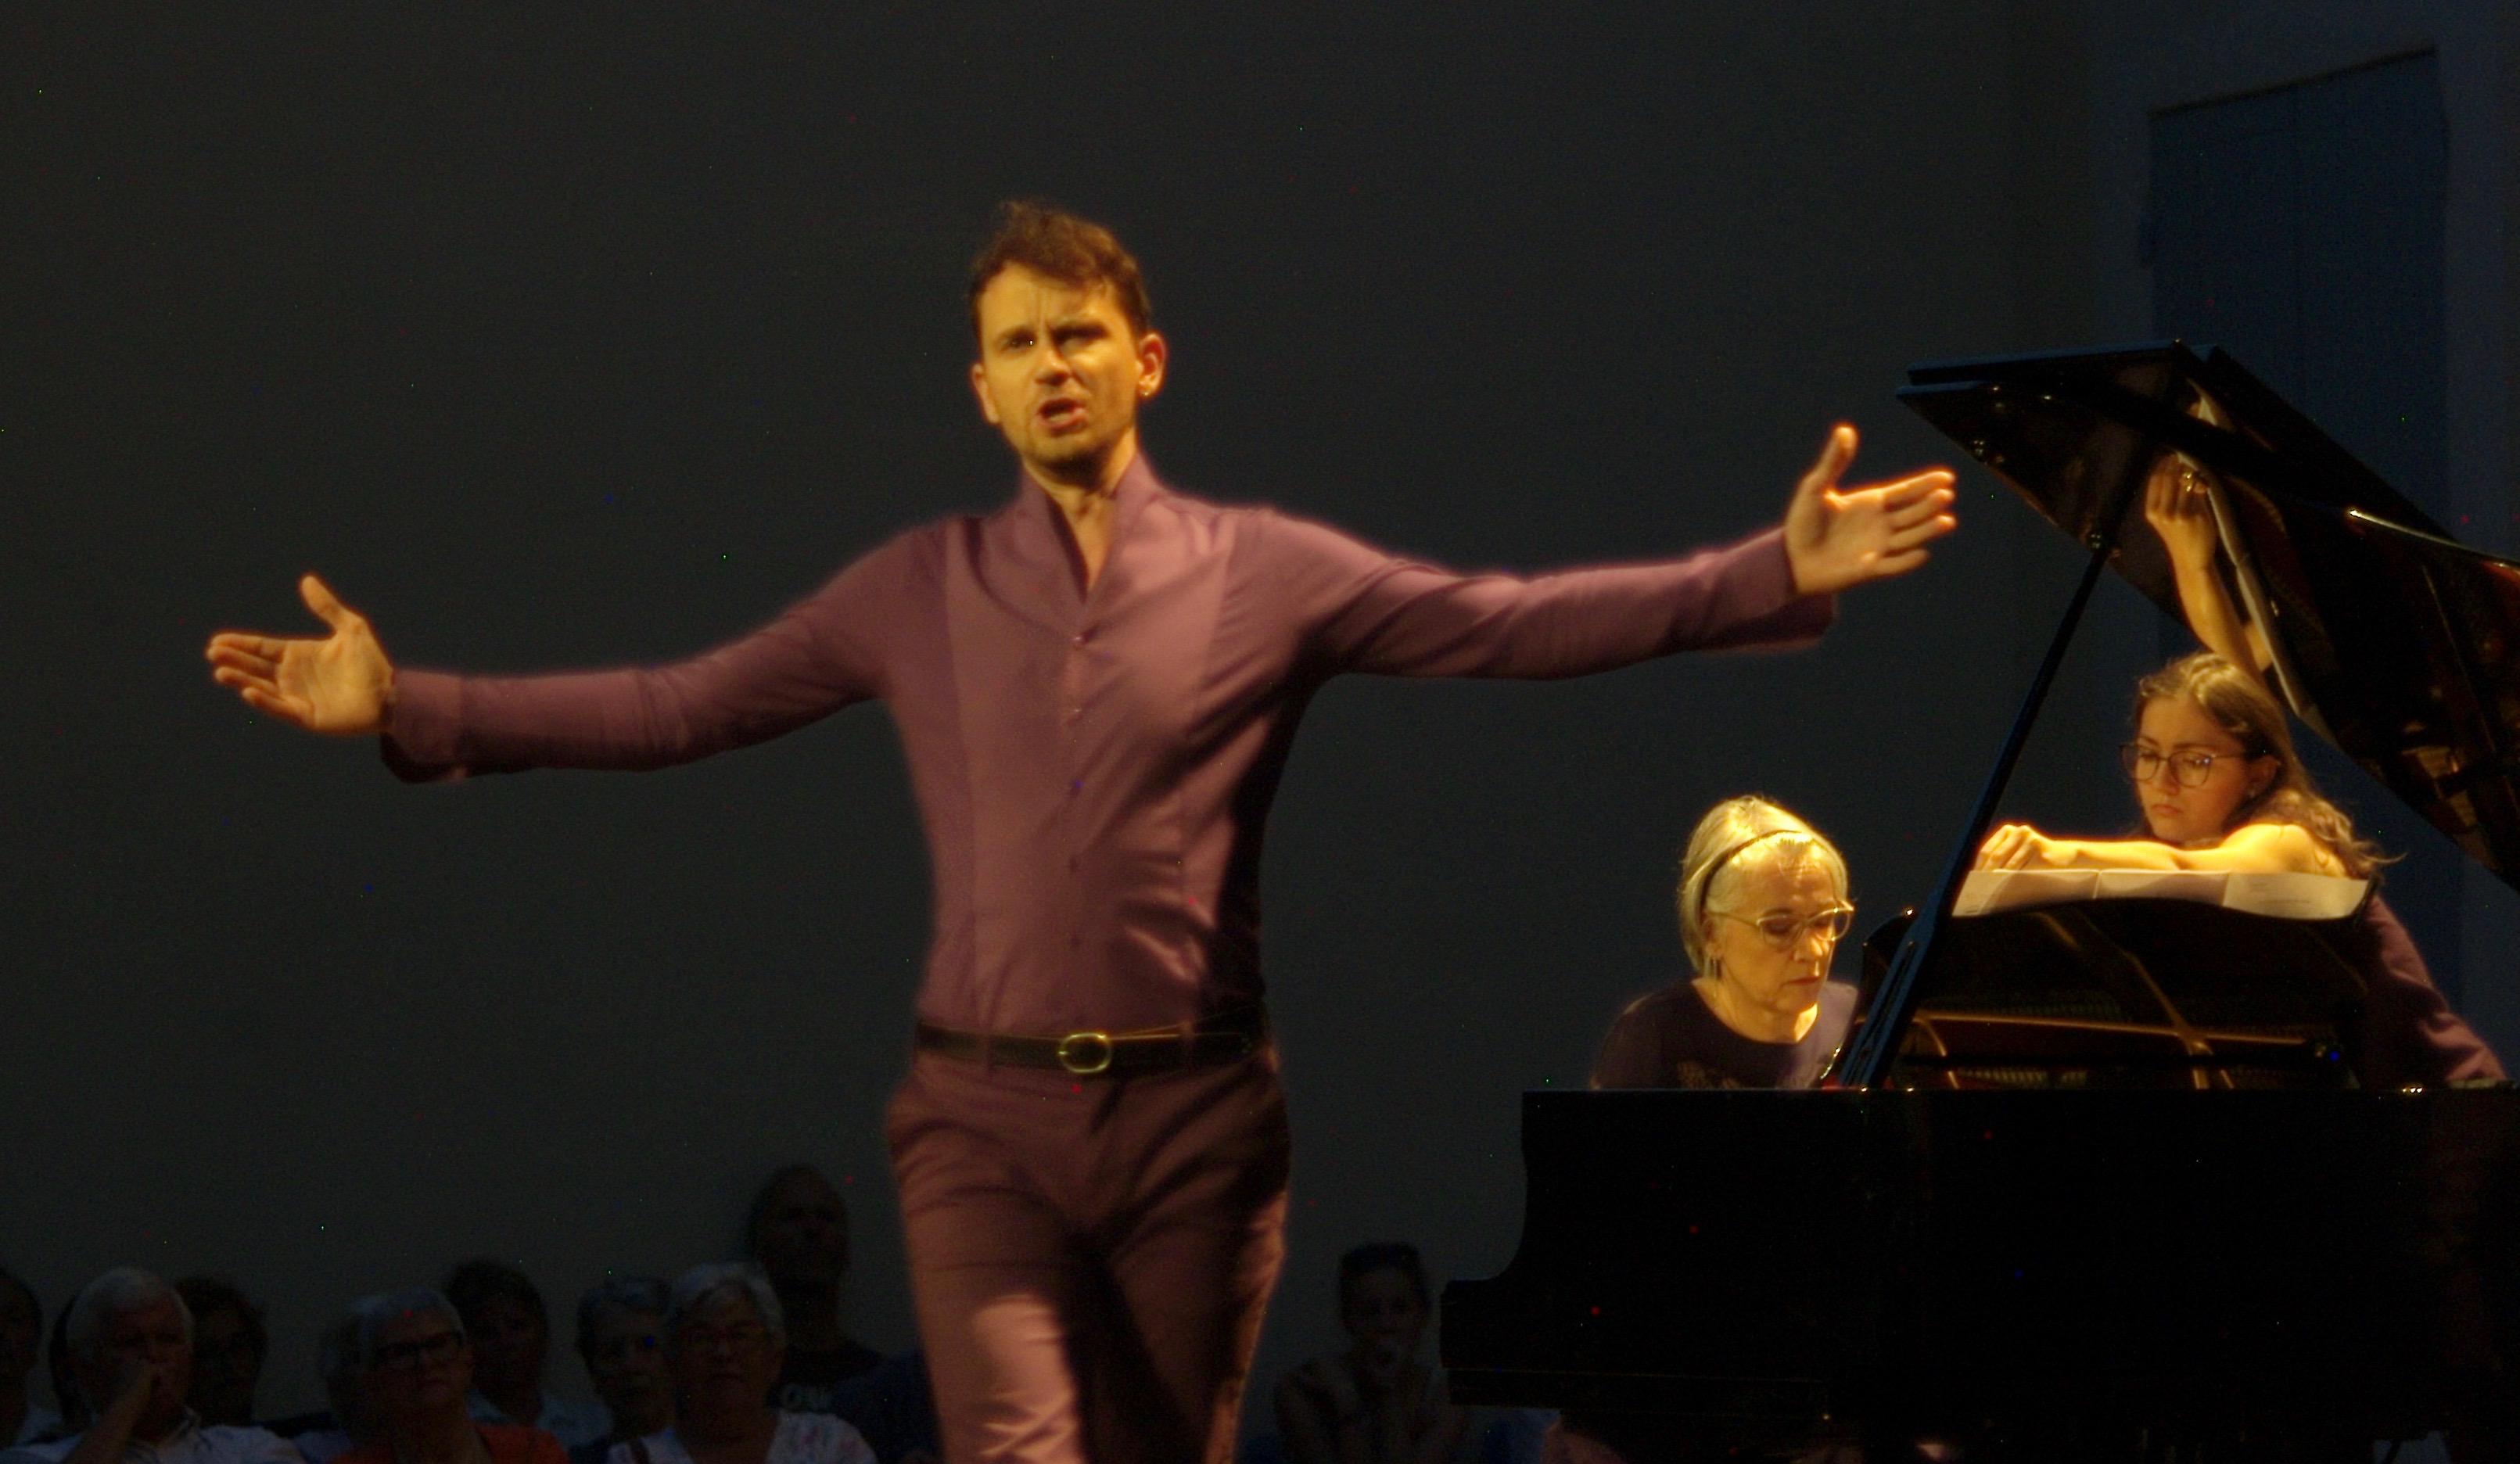 Concert Adami 2019 Jean-Christophe Lanièce